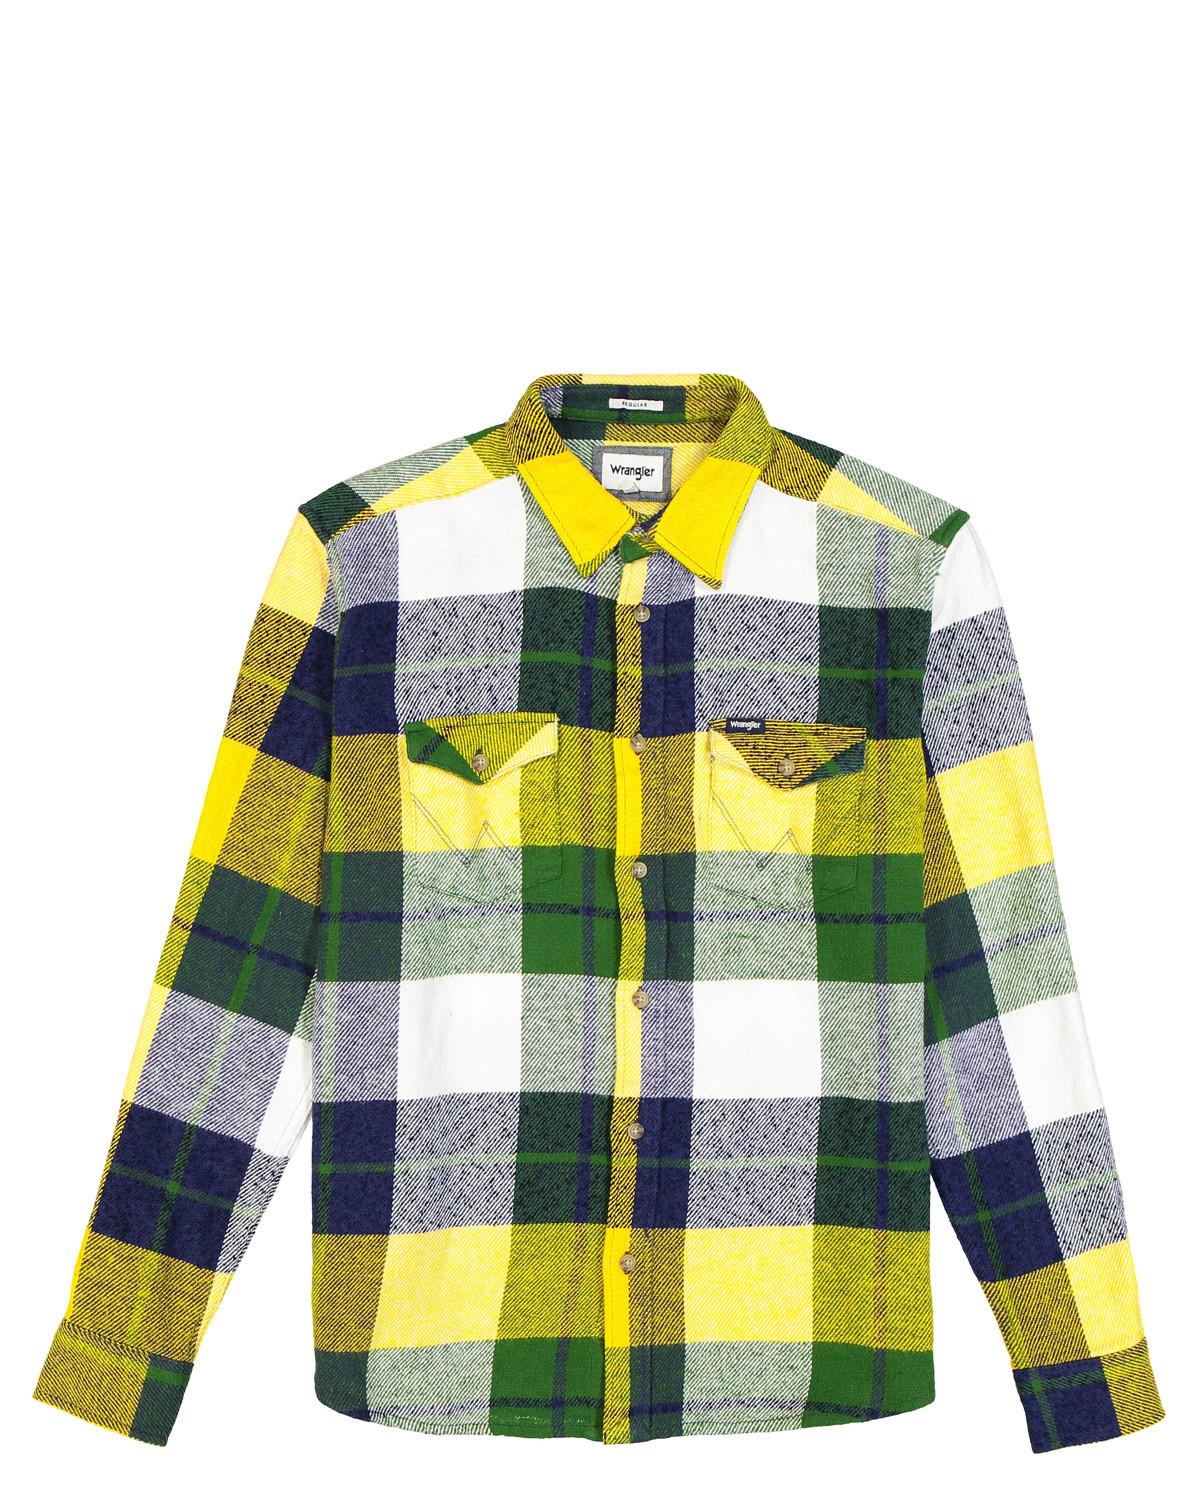 Wrangler Regular Fit Checked Two Pocket Flap Shirt (Yellow, XL)